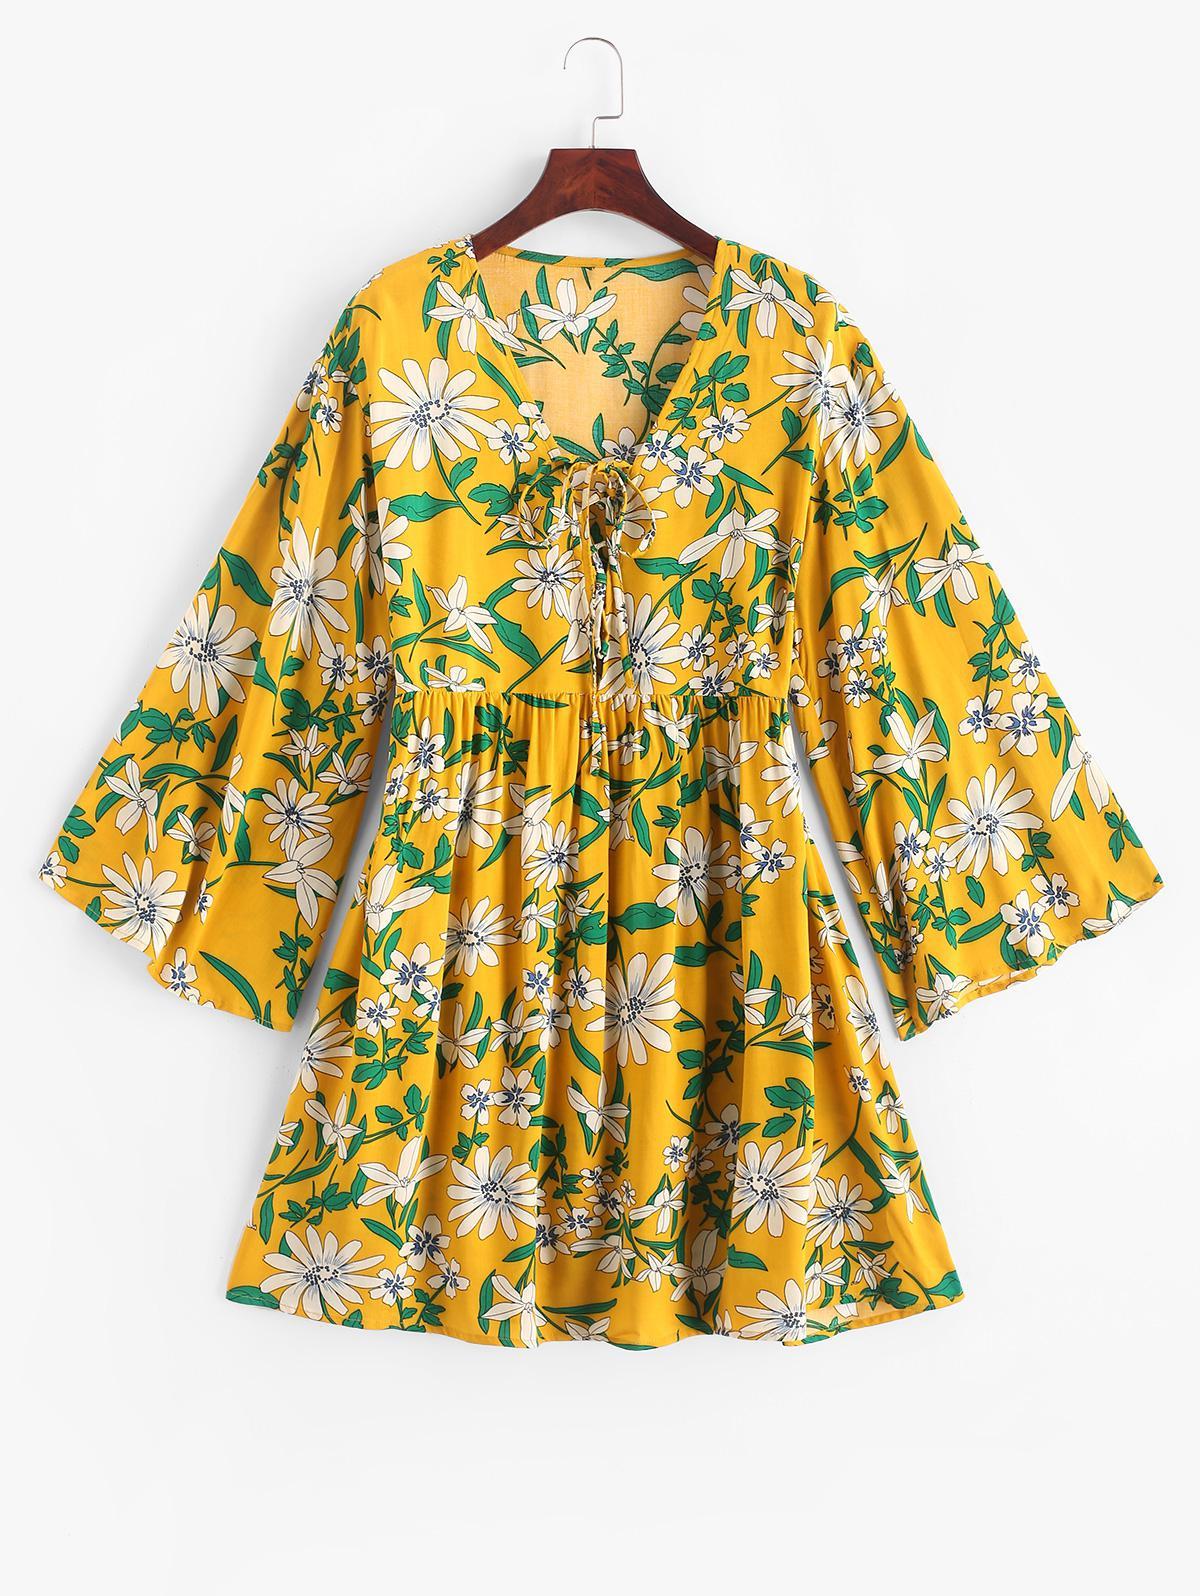 ZAFUL Flower Print Lace Up Long Sleeve Smock Dress thumbnail